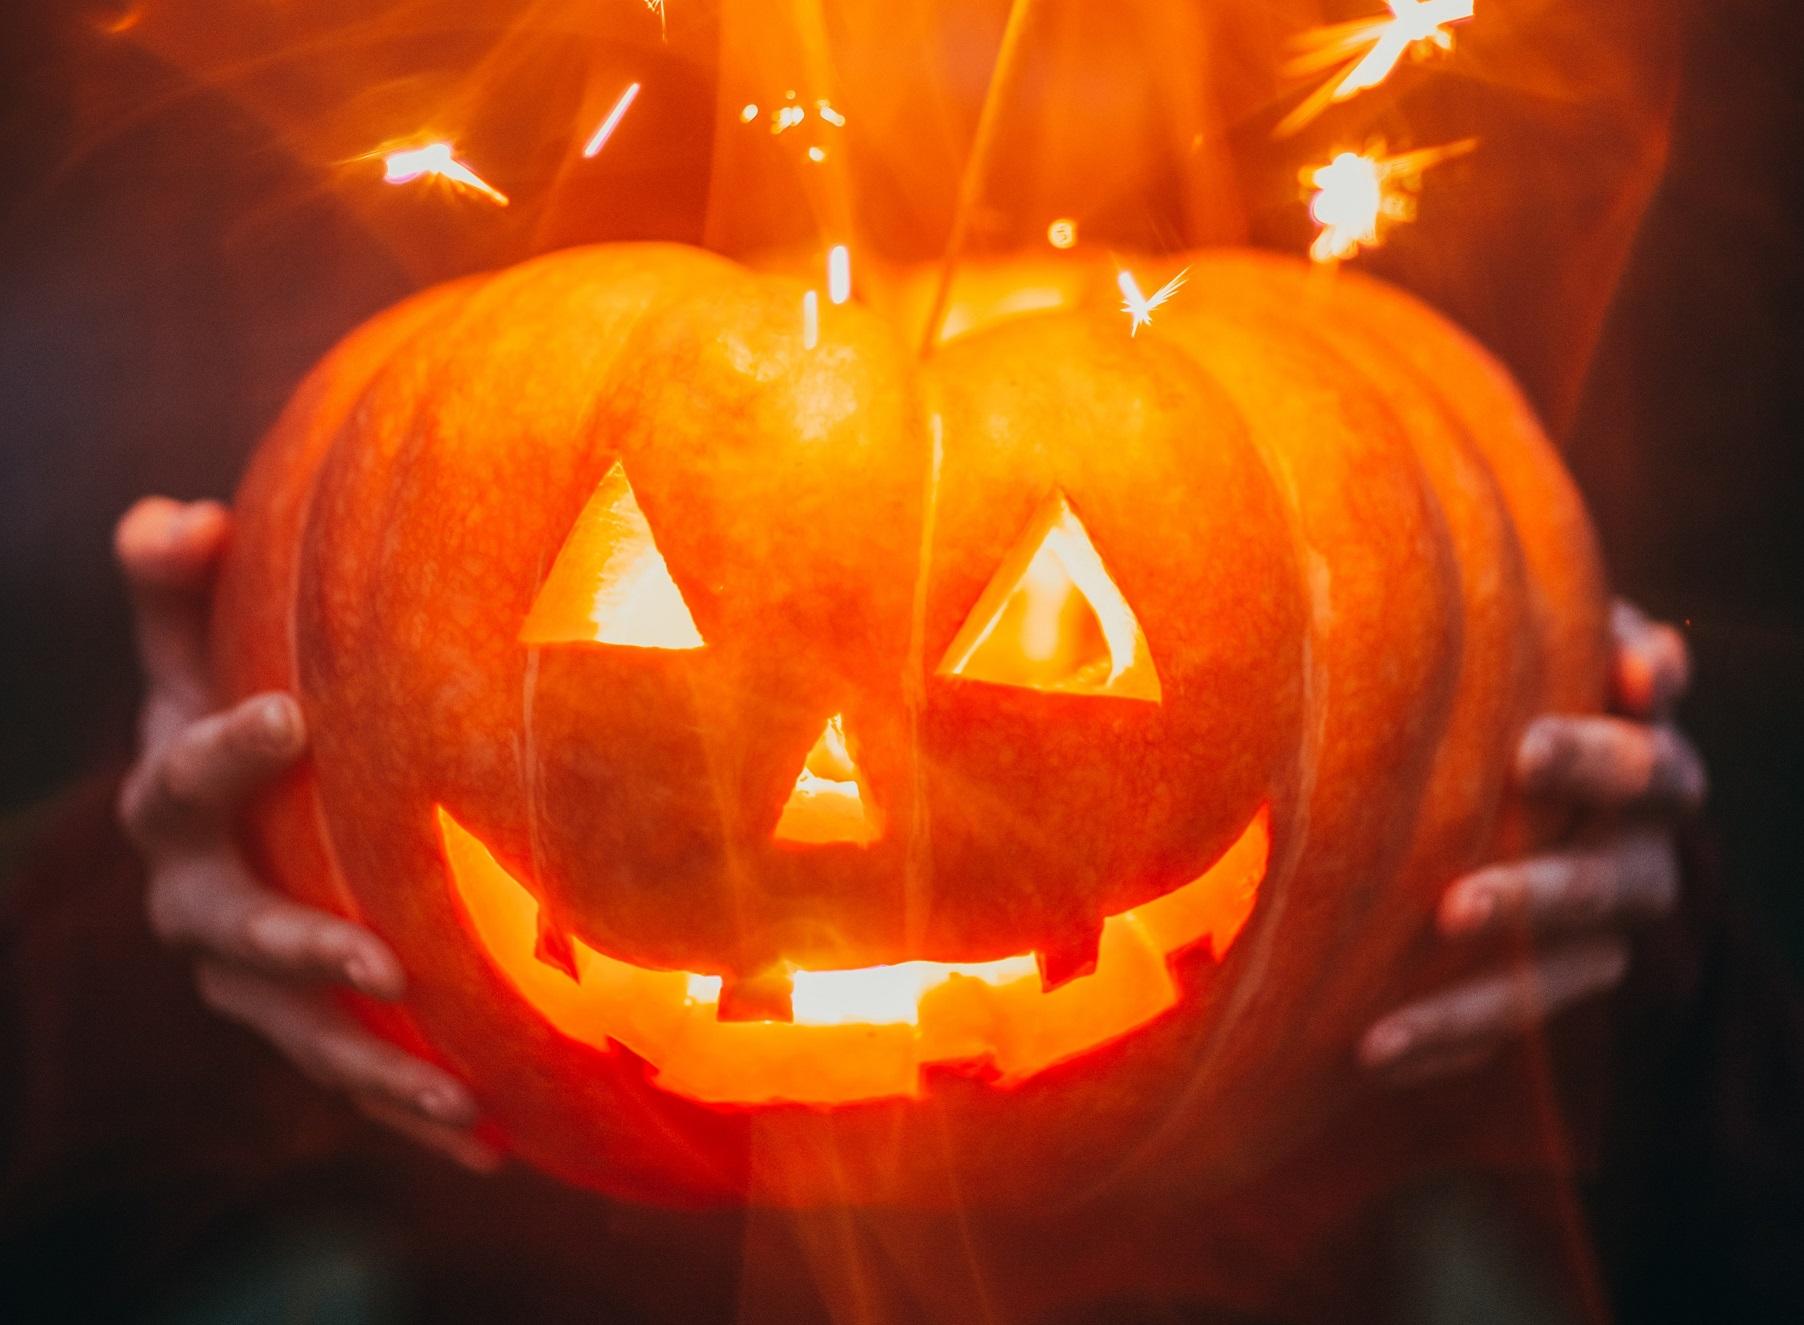 Help the elderly celebrate Halloween safely